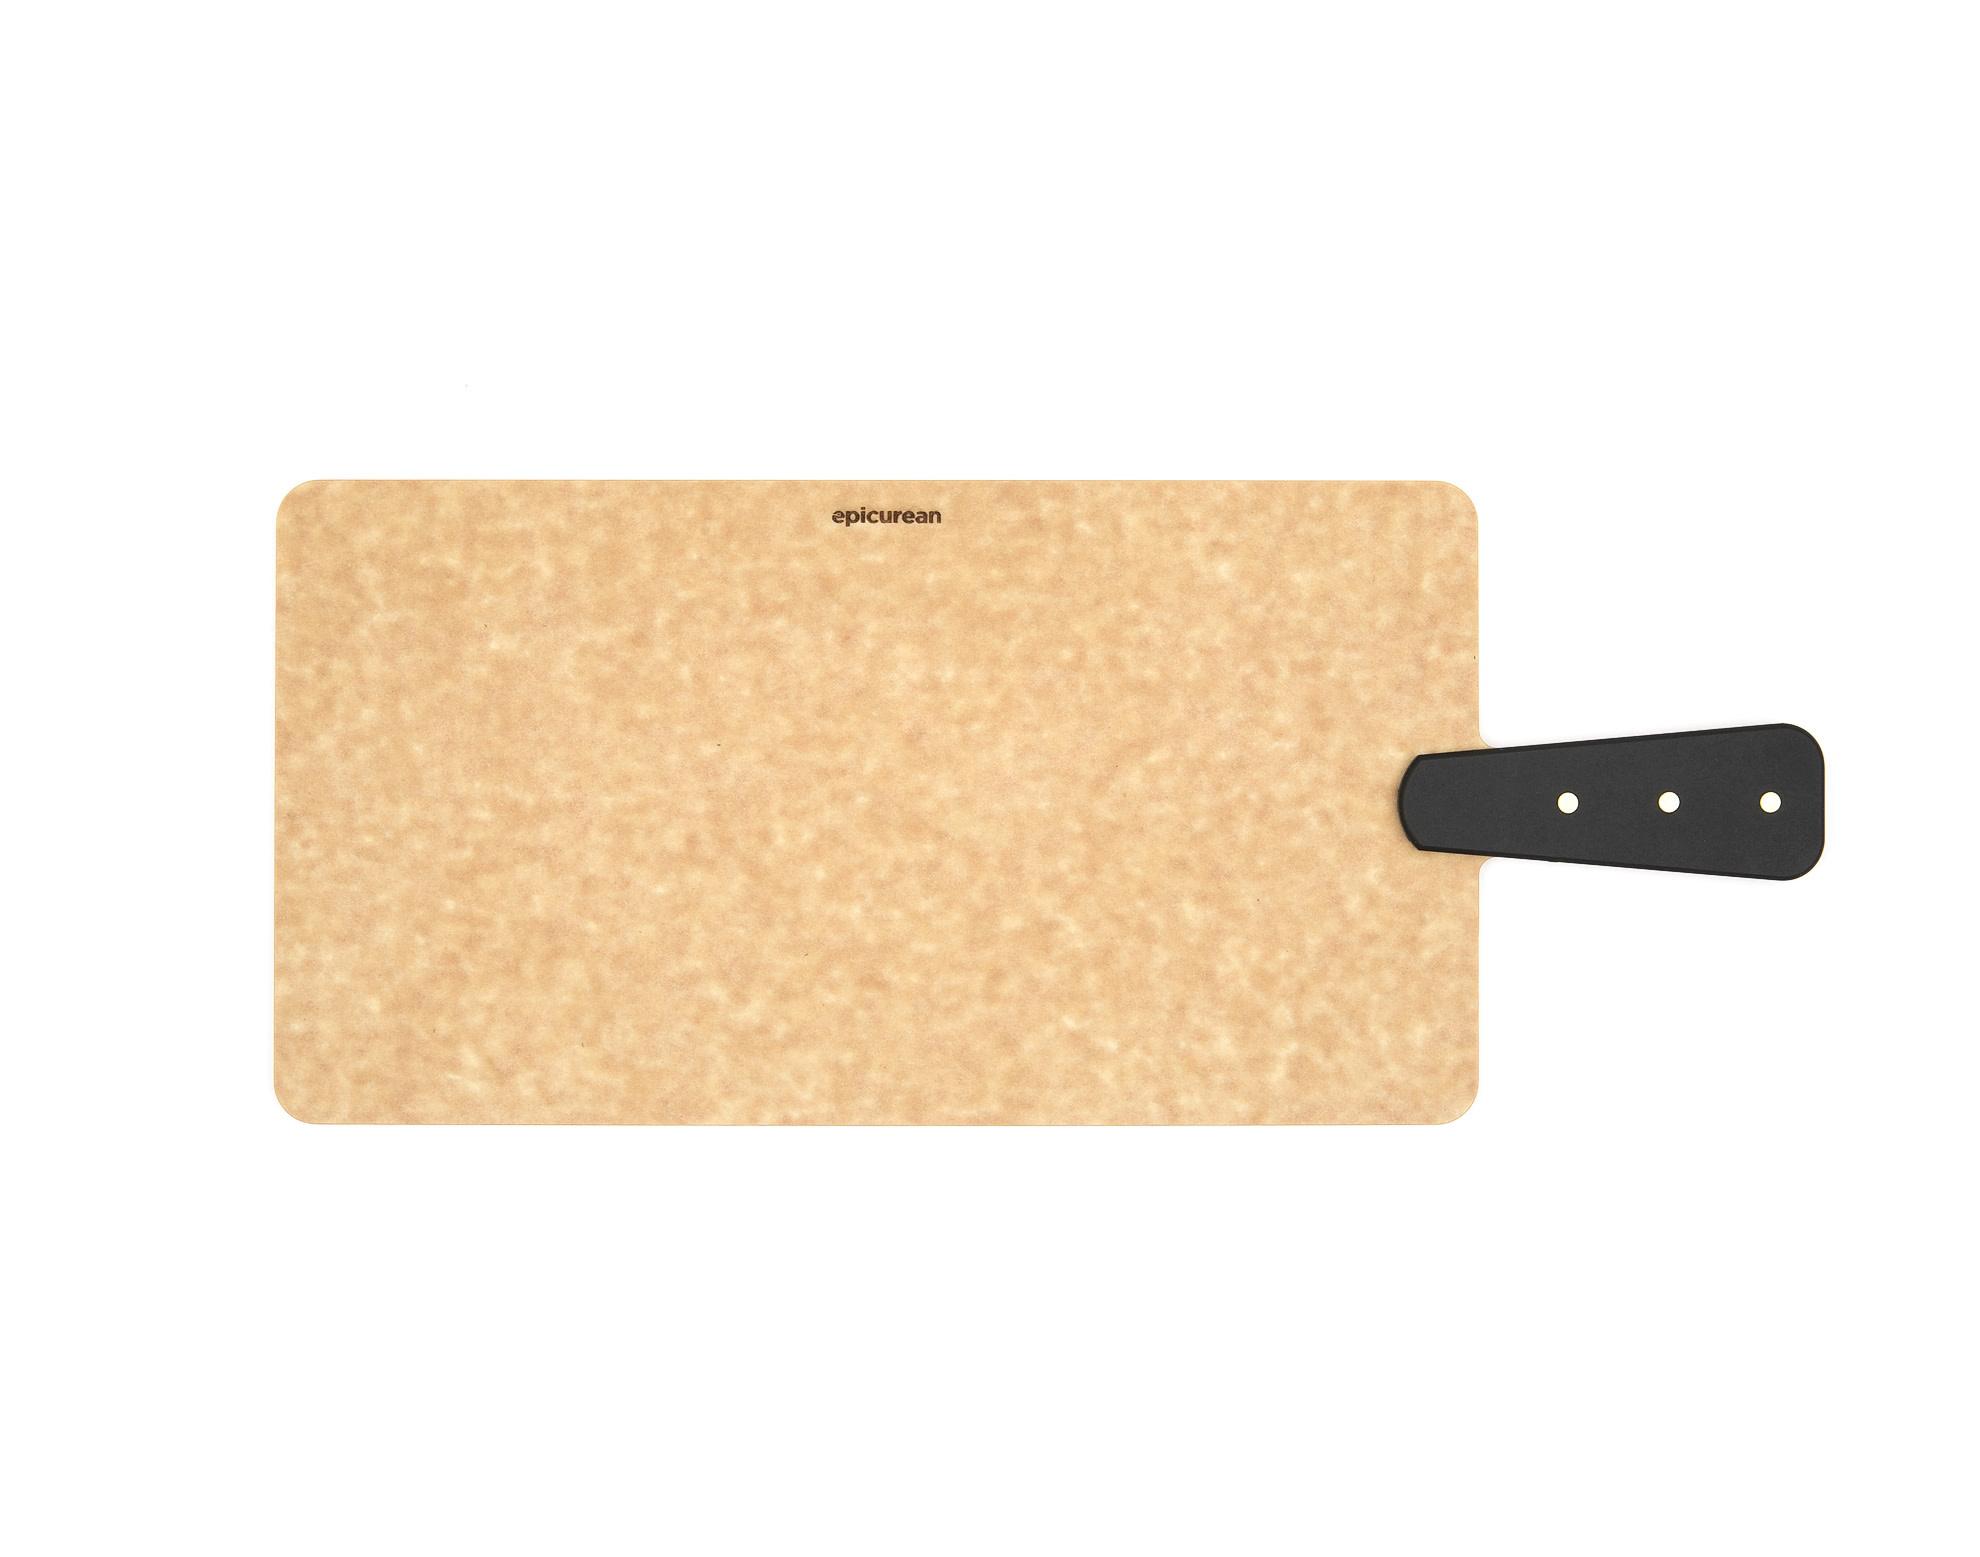 Epicurean Cutting Board Riveted Handle Handy 14in X 7.5in